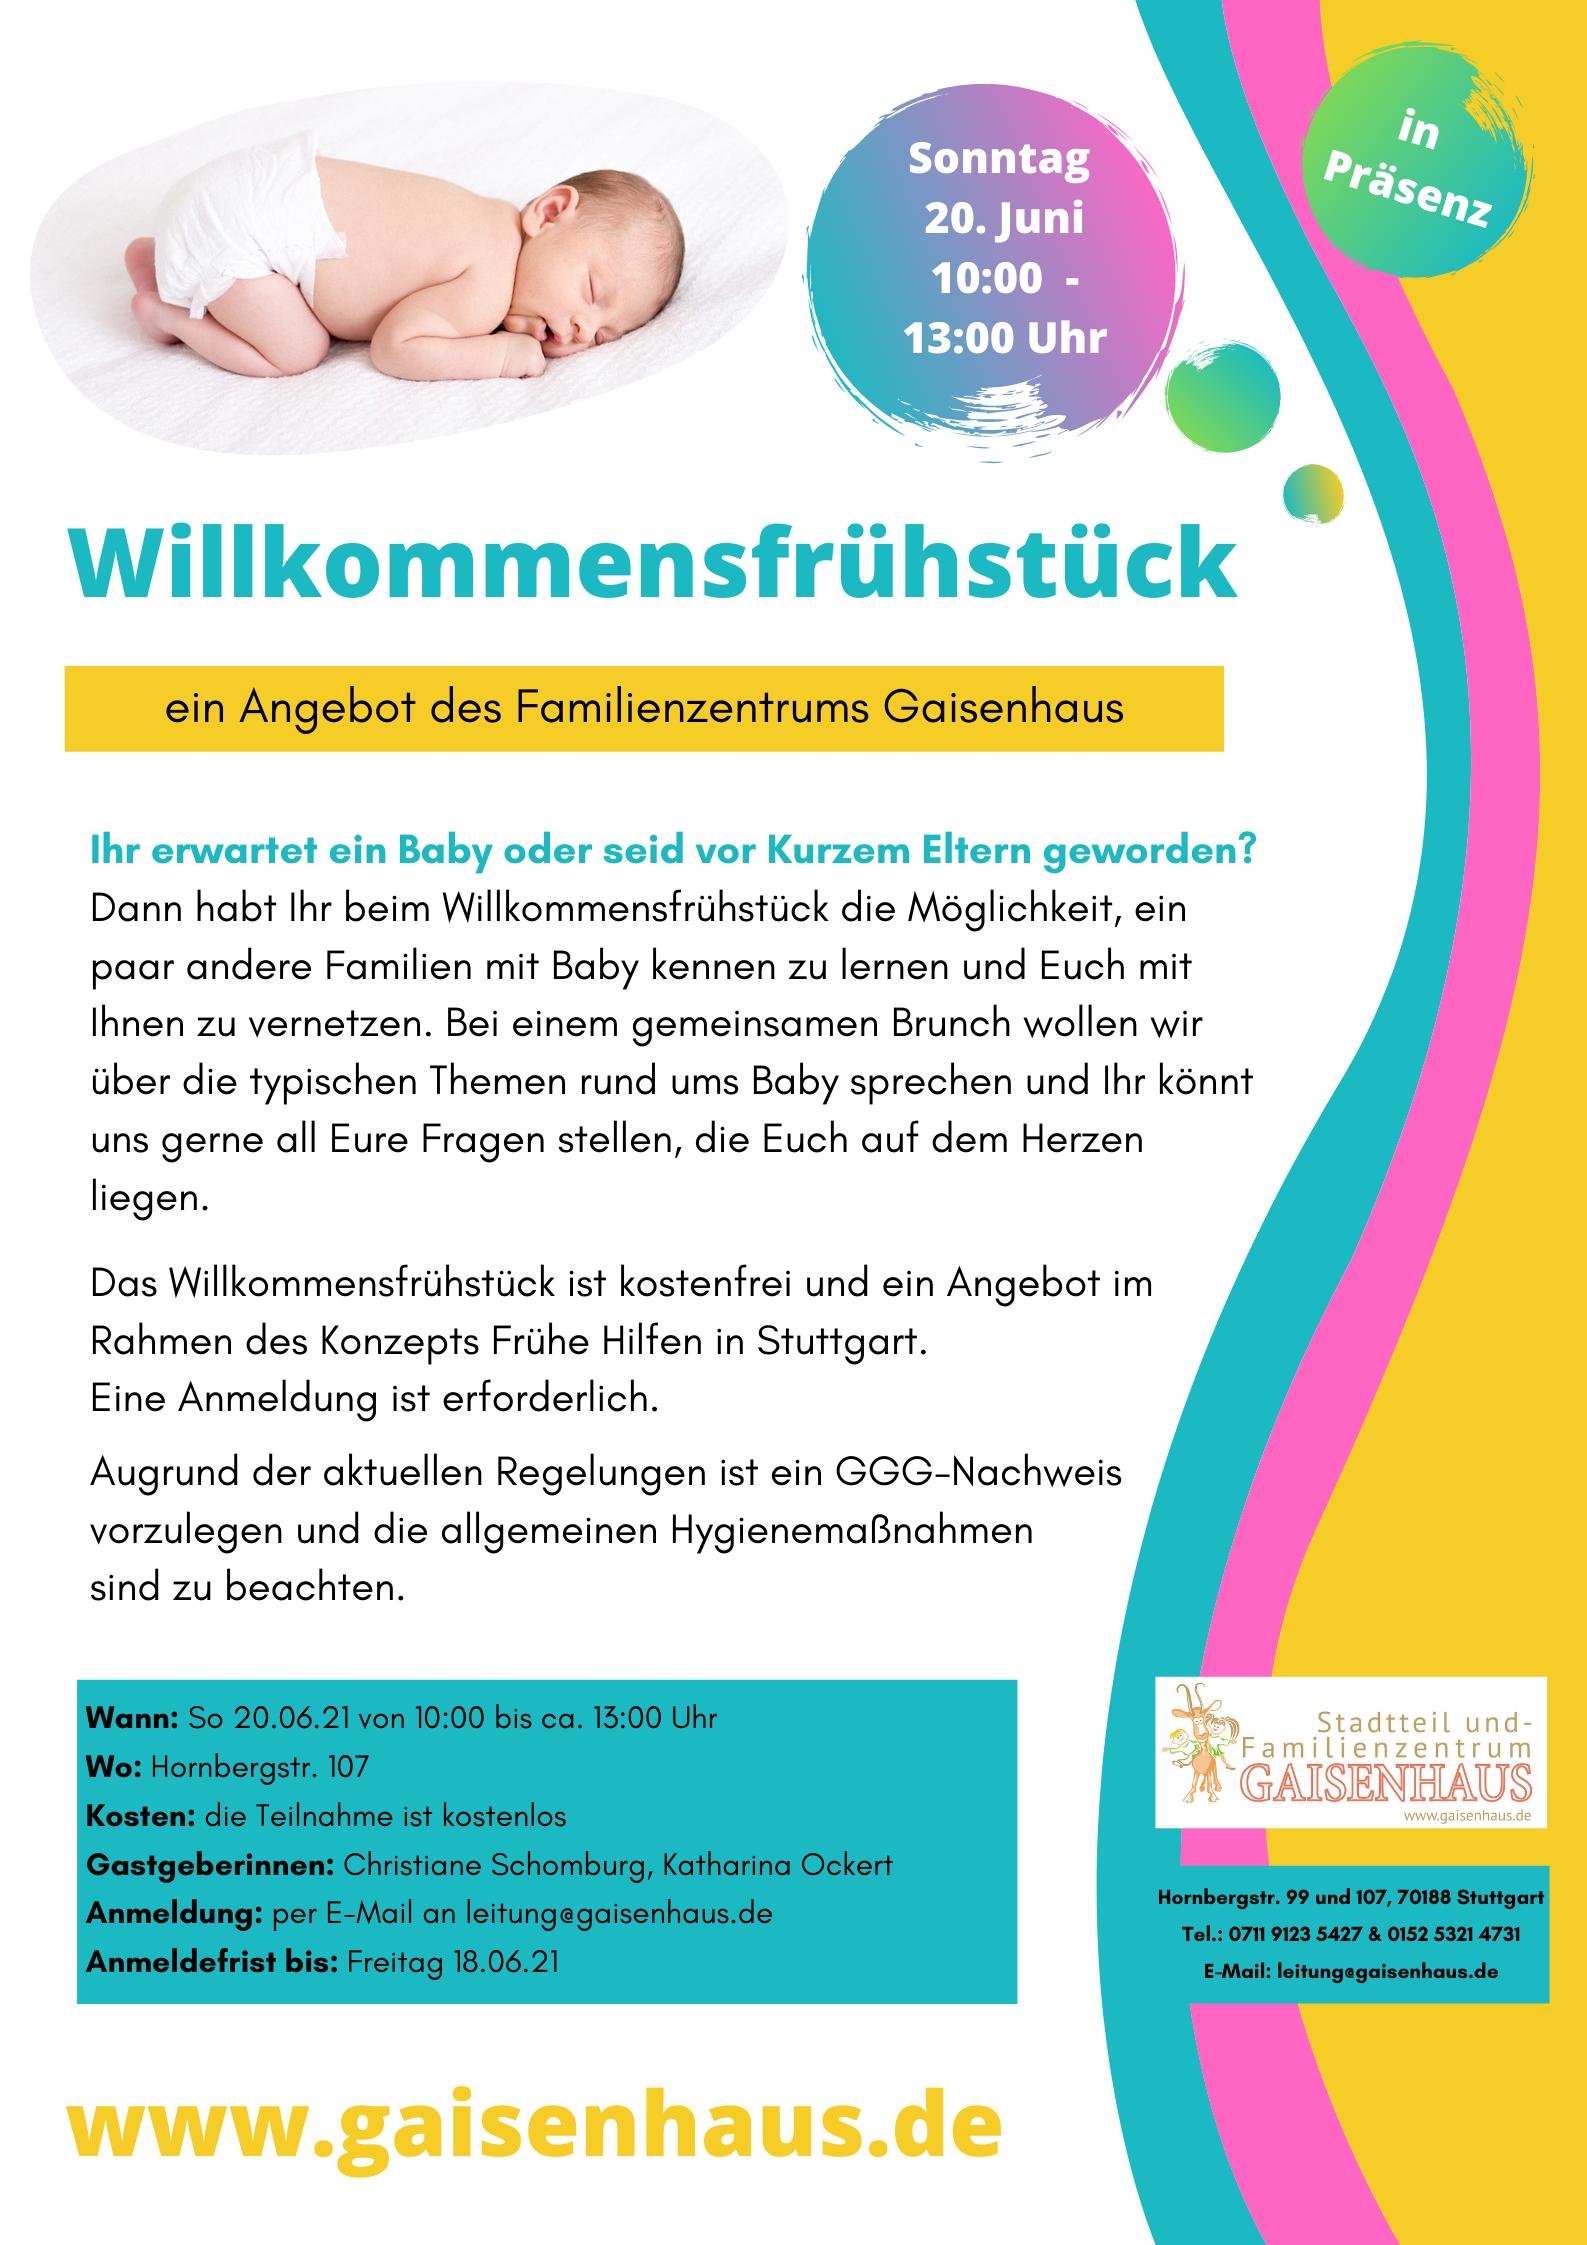 plakat-willkommensfruehstueck-20.6.2021